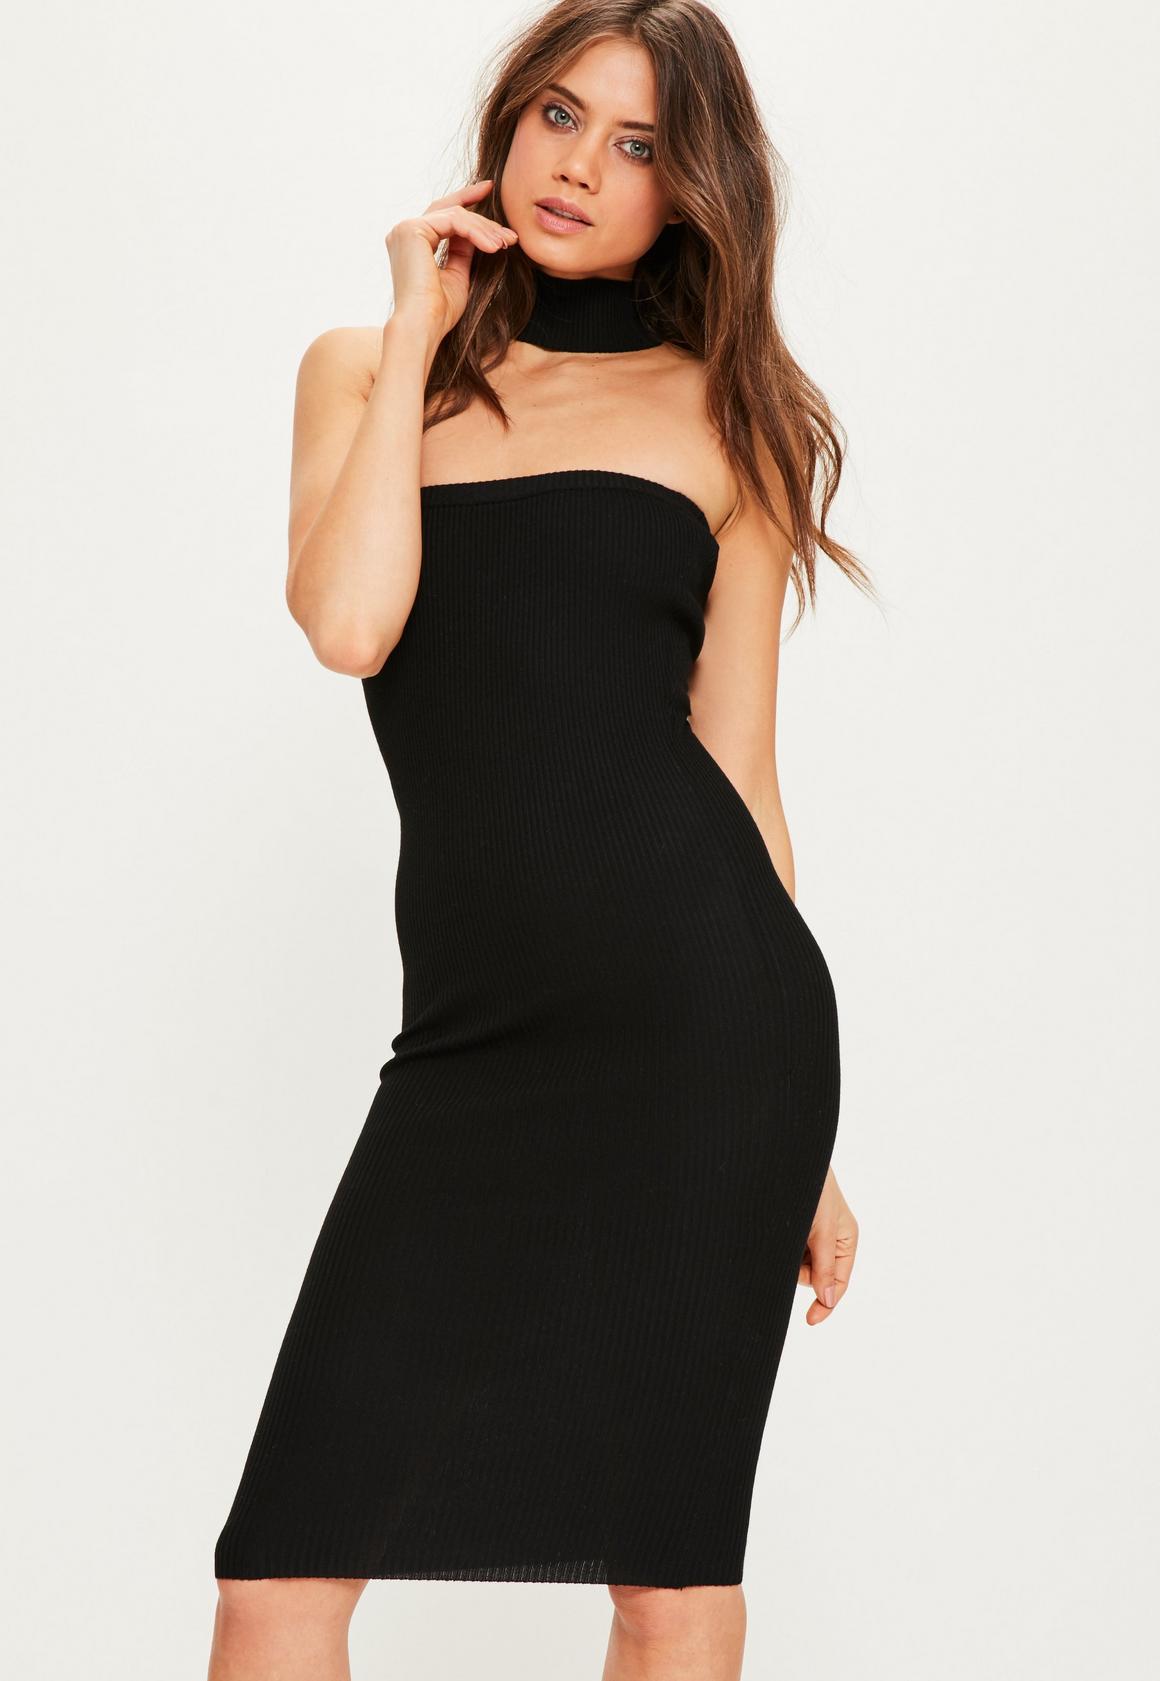 Strapless Dress - Bandeau Dresses | Missguided